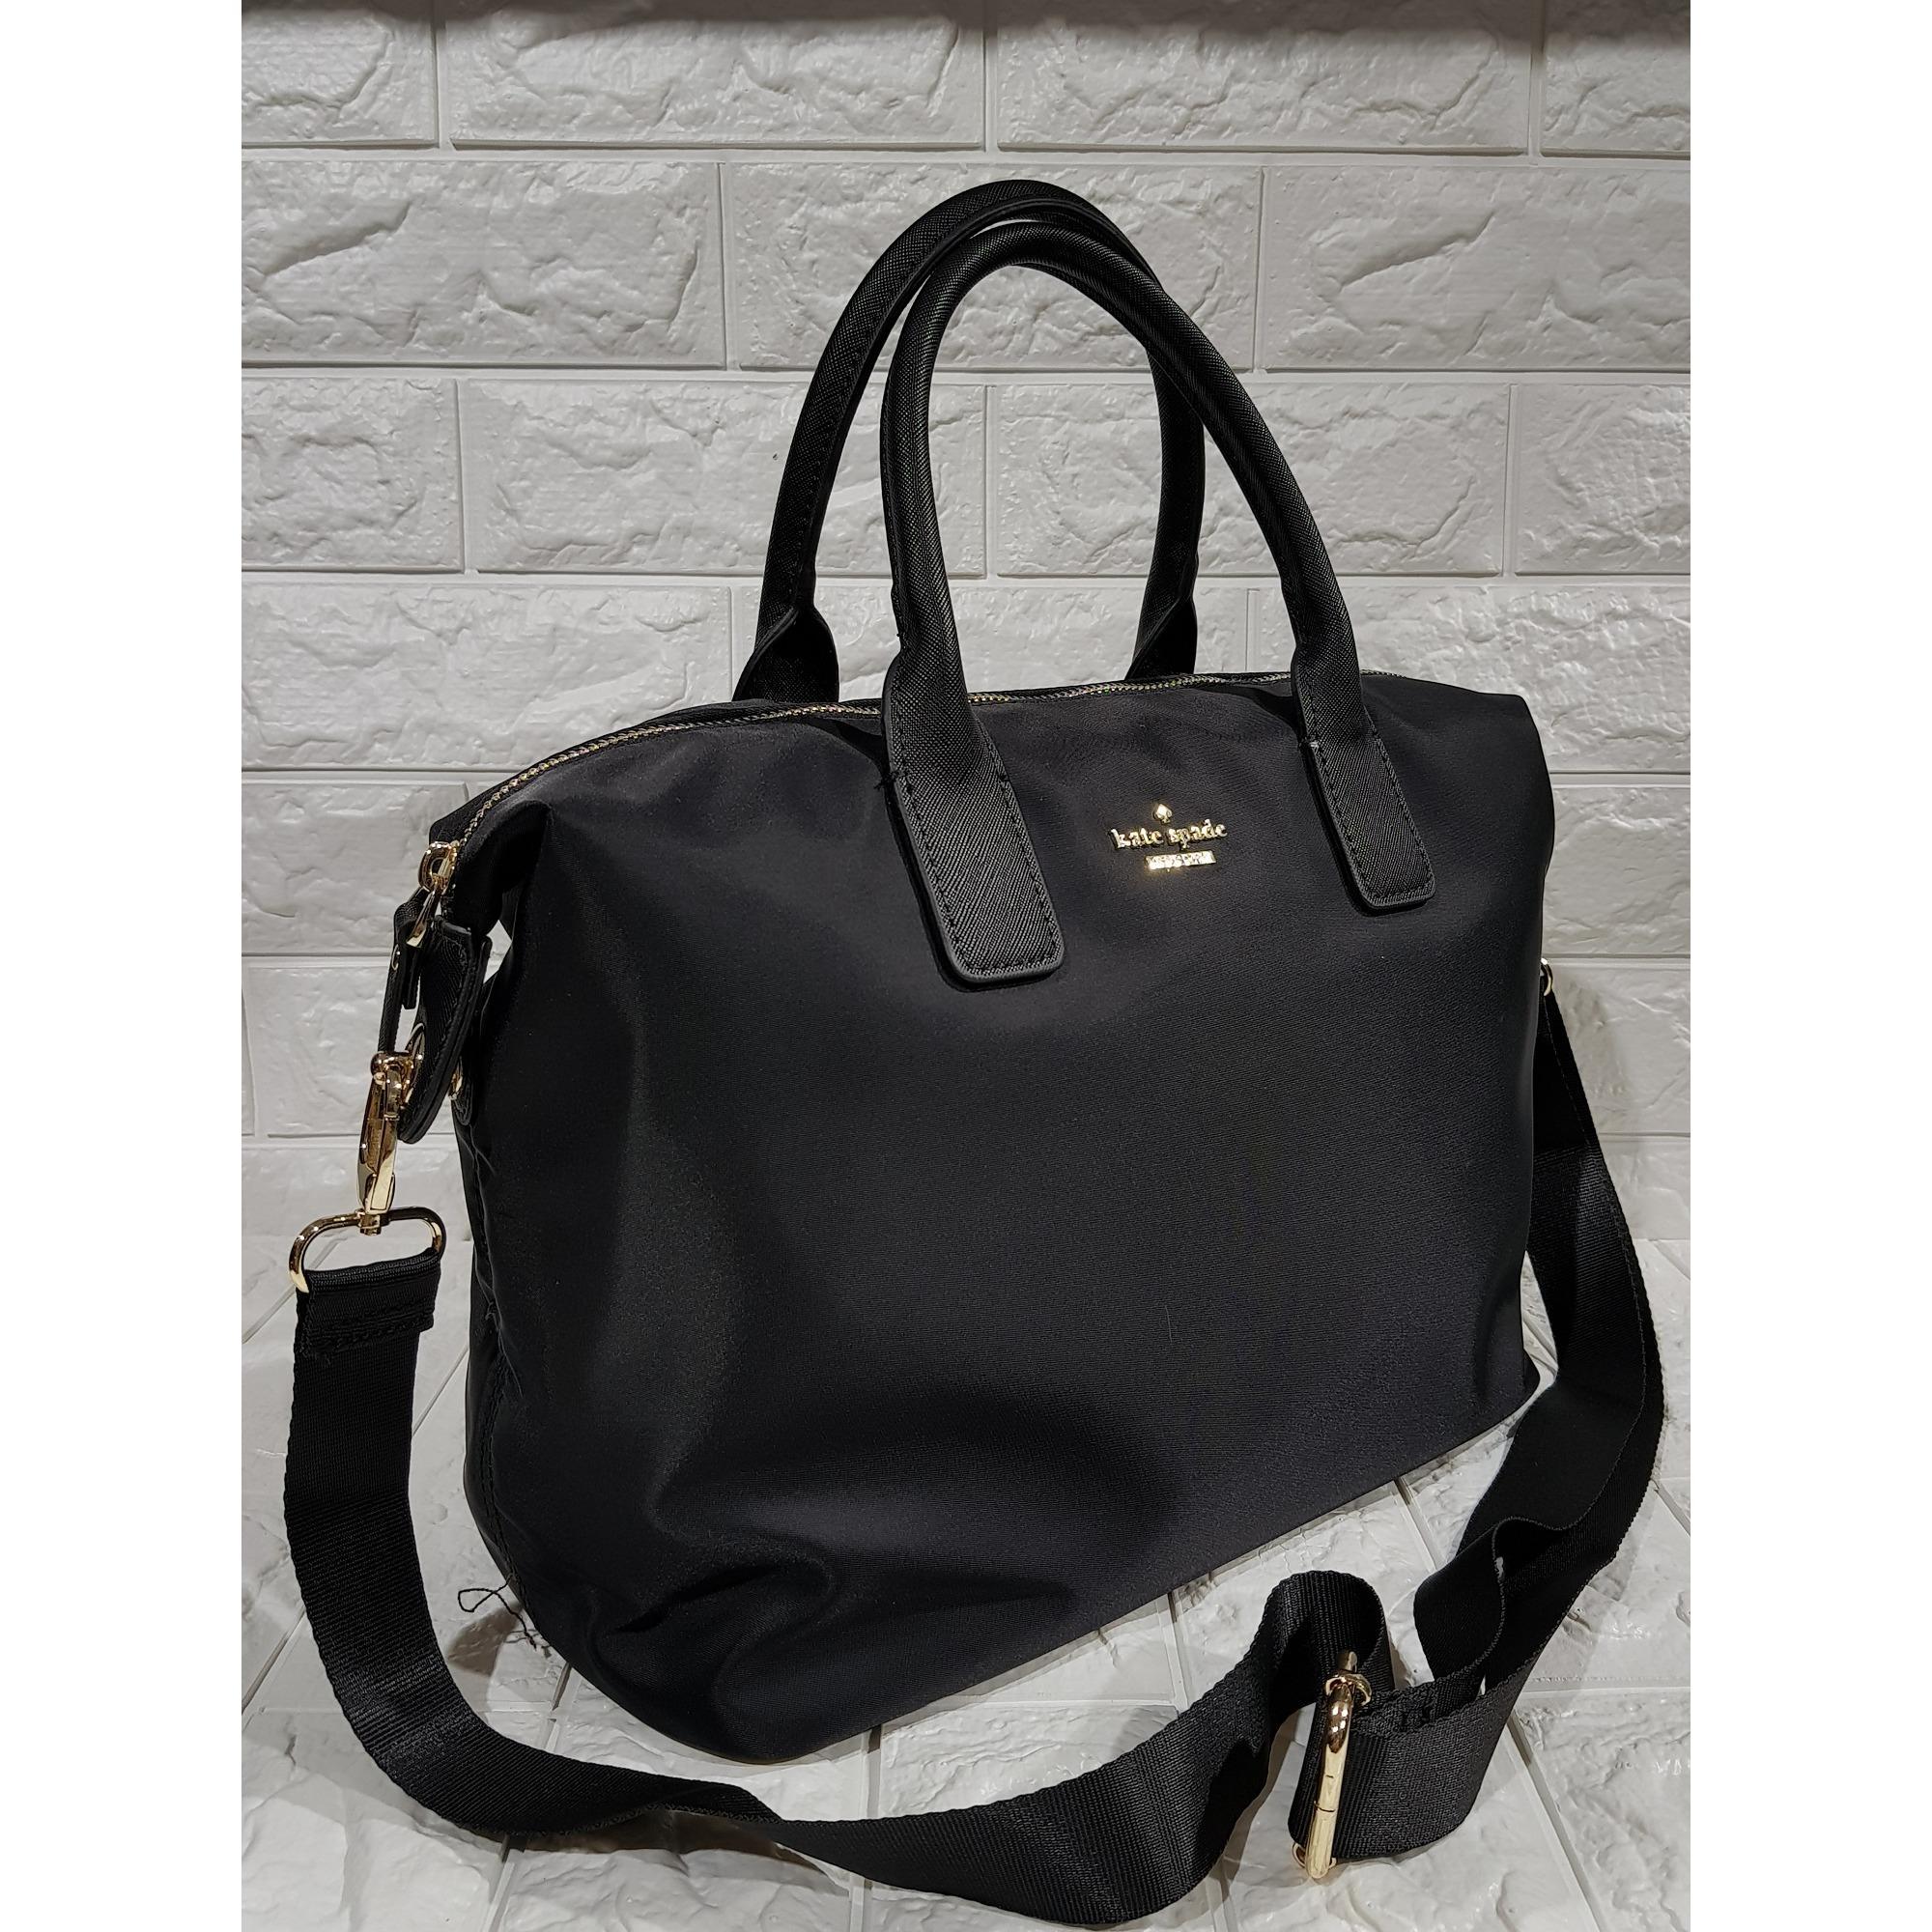 Kate Spade Classic Weekender Bag Lyla Black